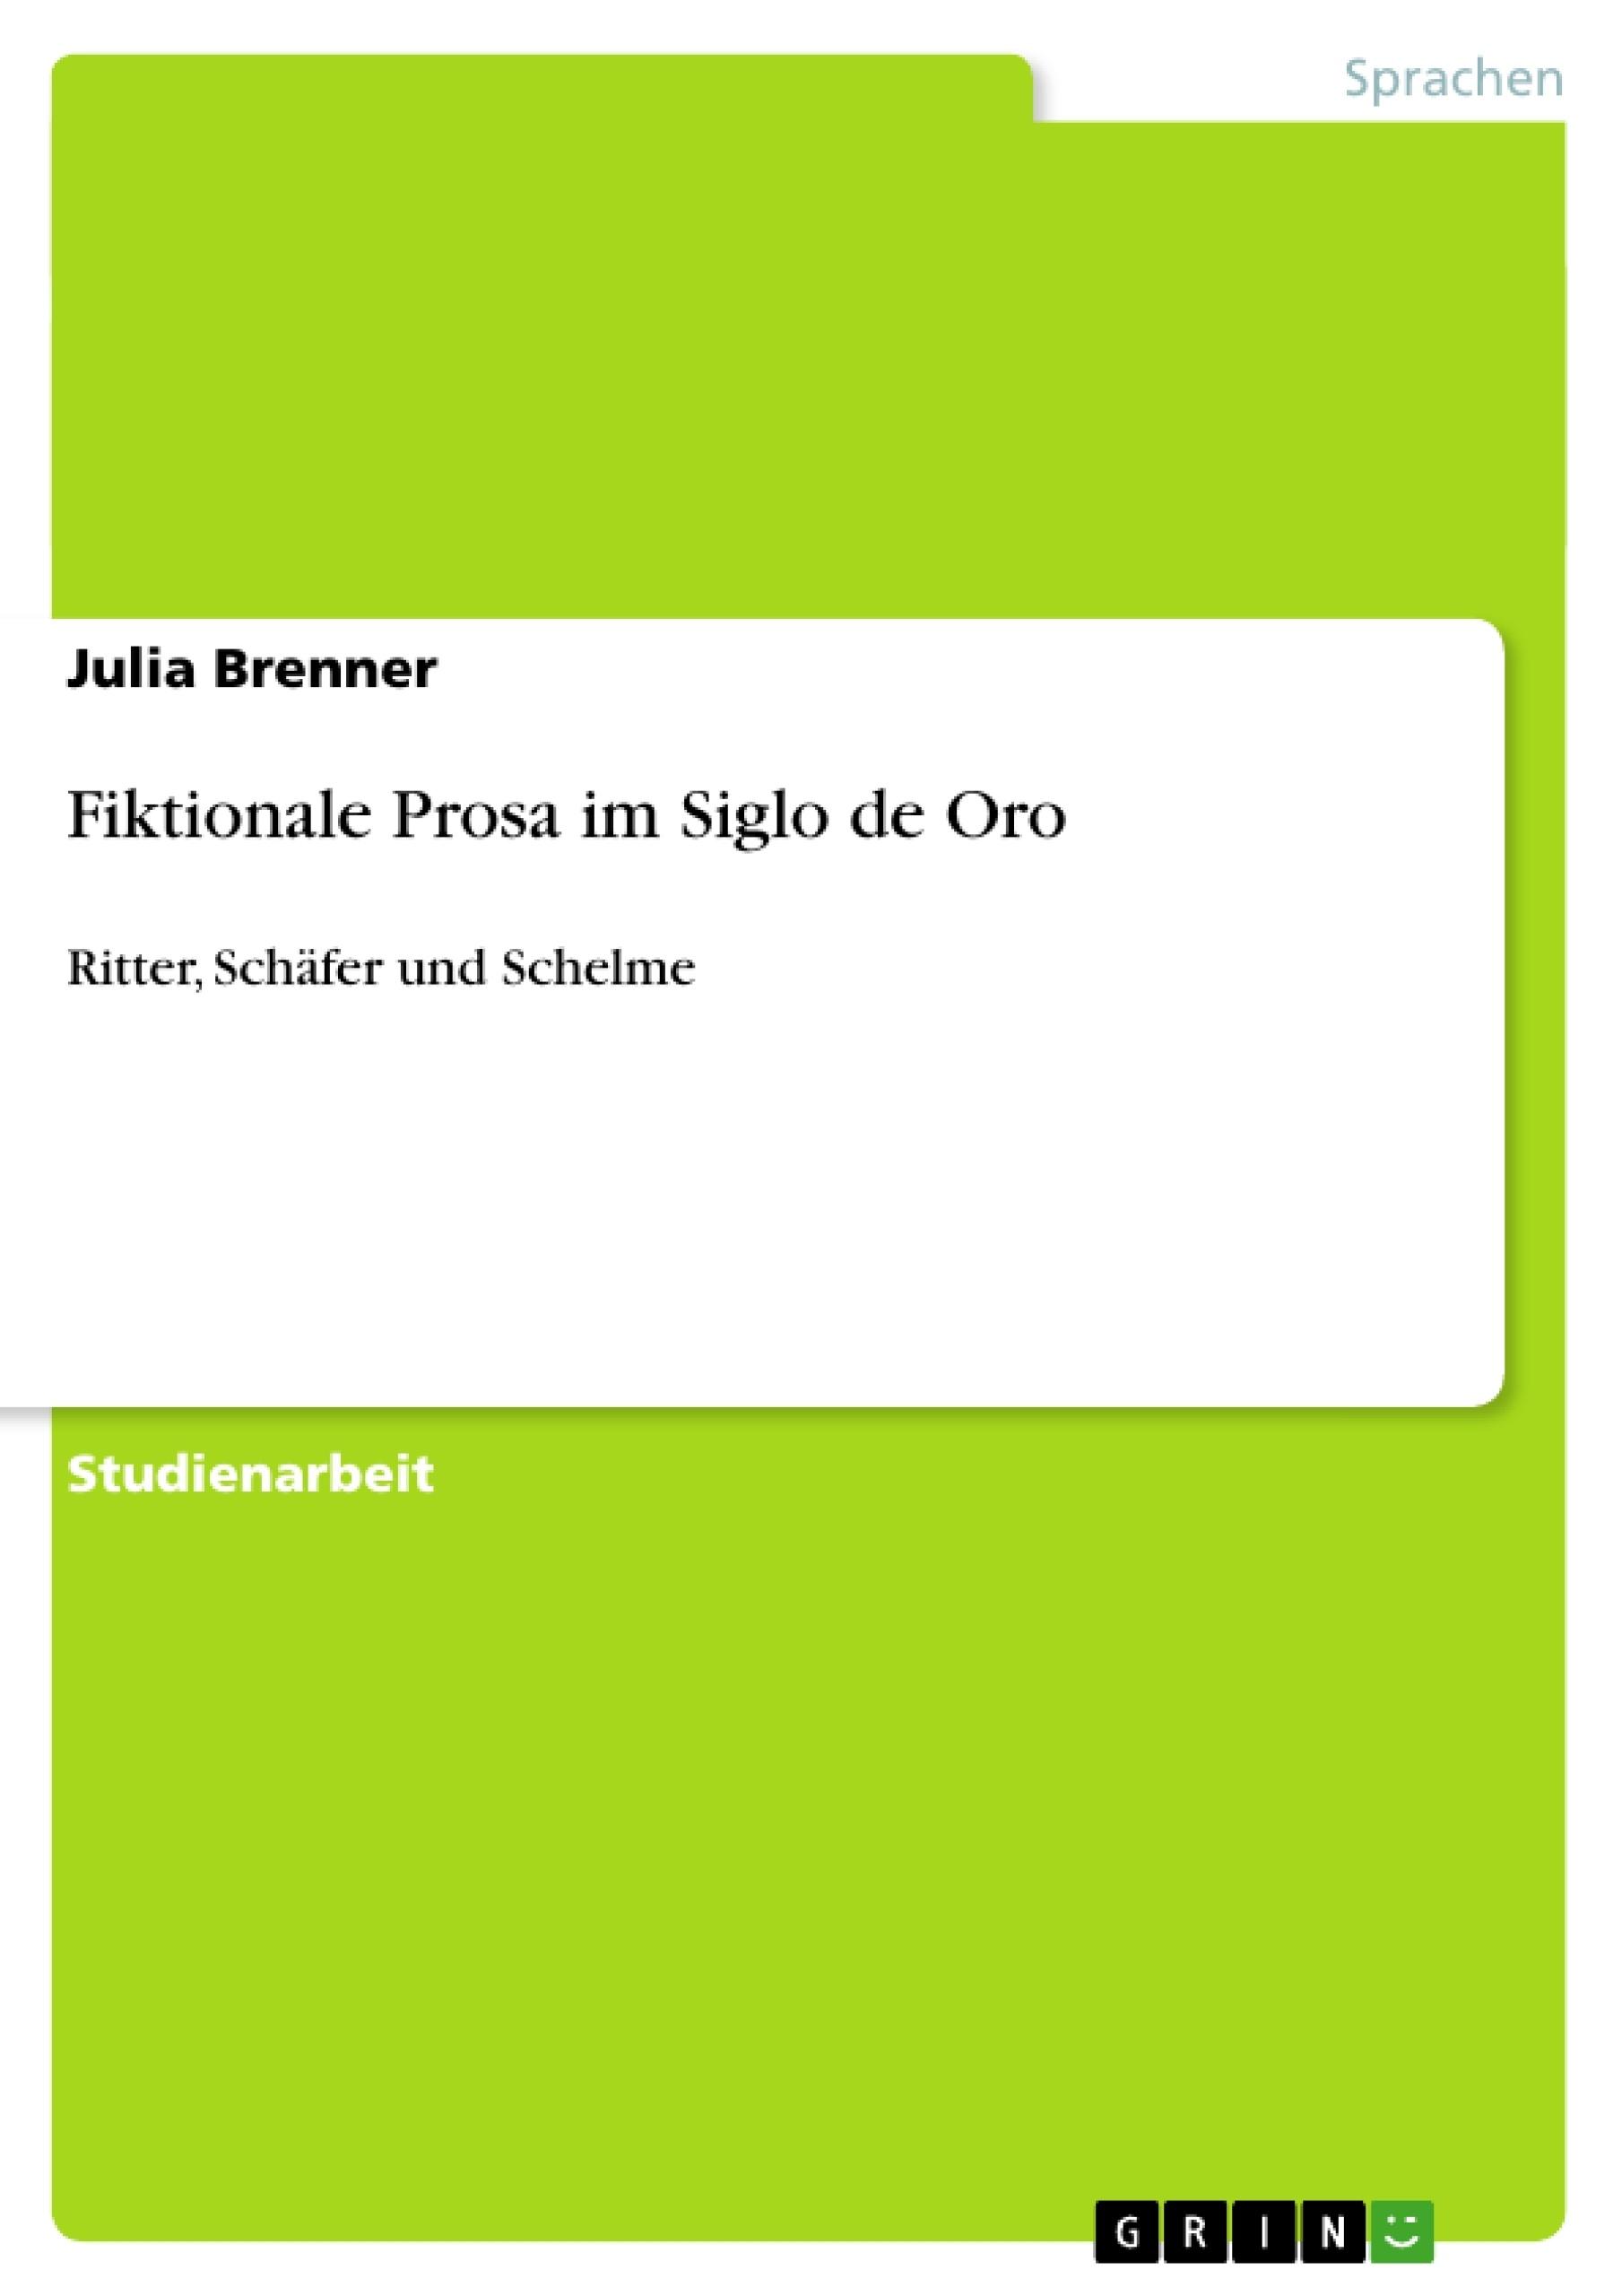 Titel: Fiktionale Prosa im Siglo de Oro